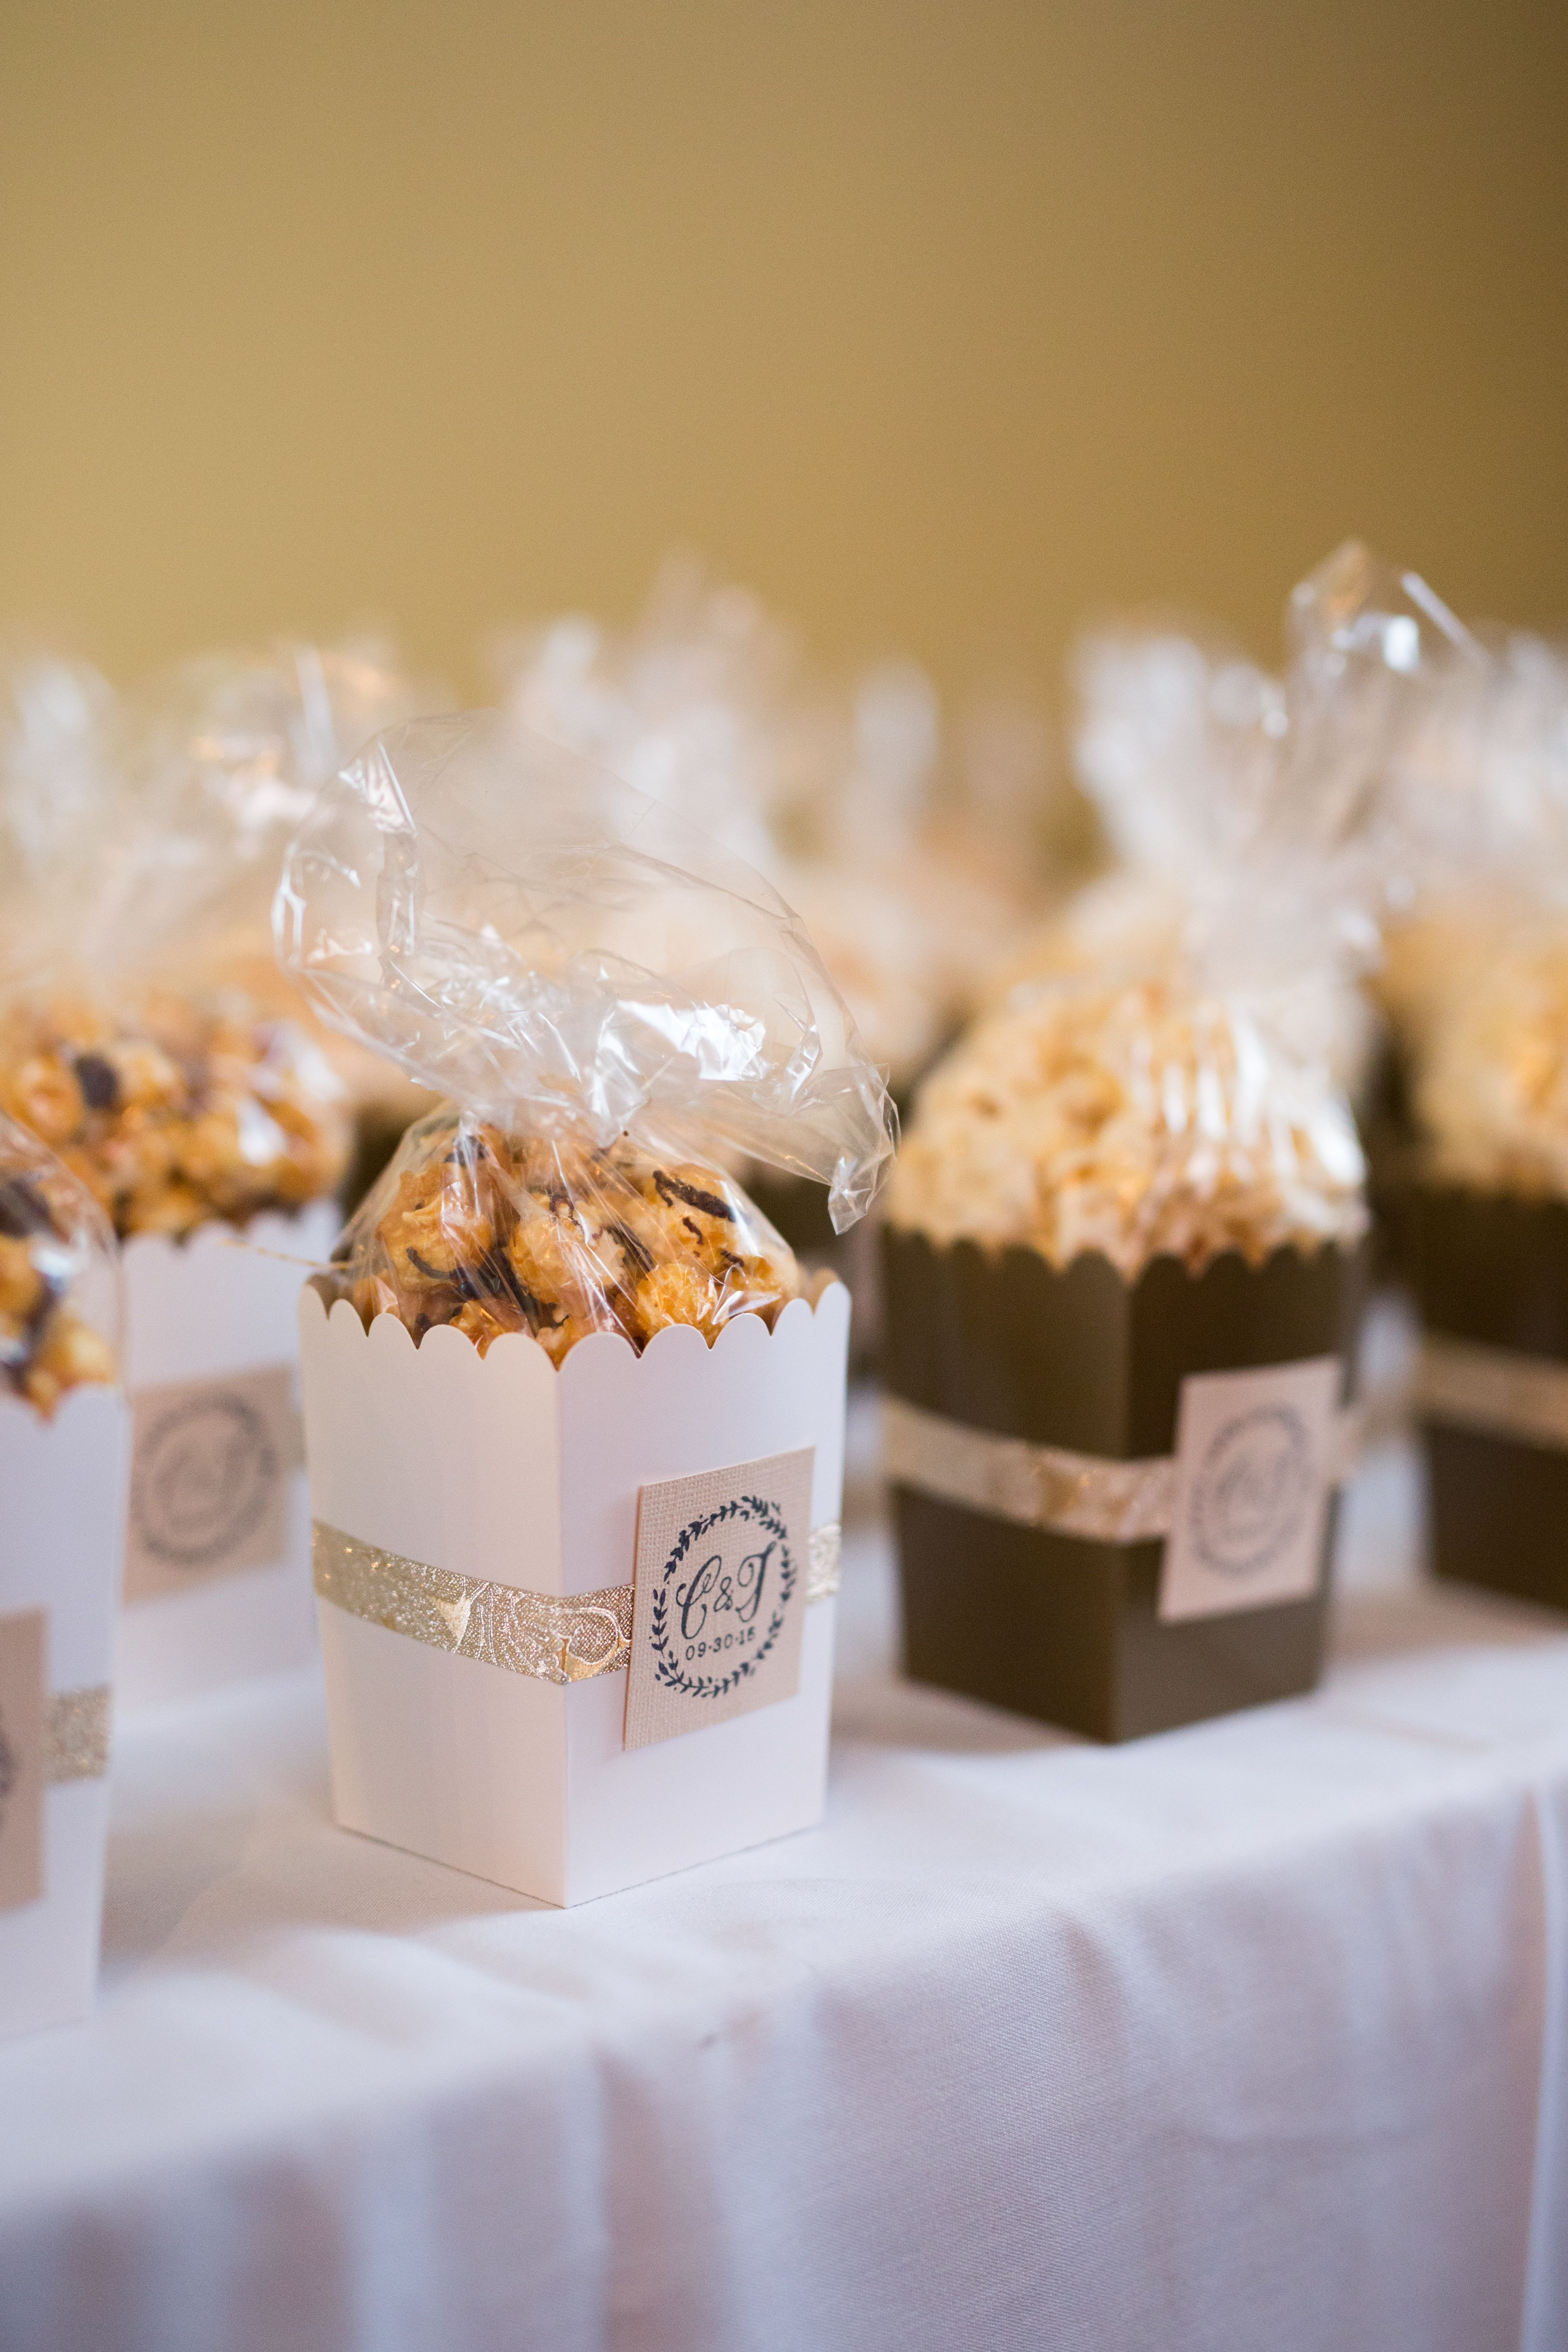 Small caramel corn or candy favor boxes Popcorn wedding